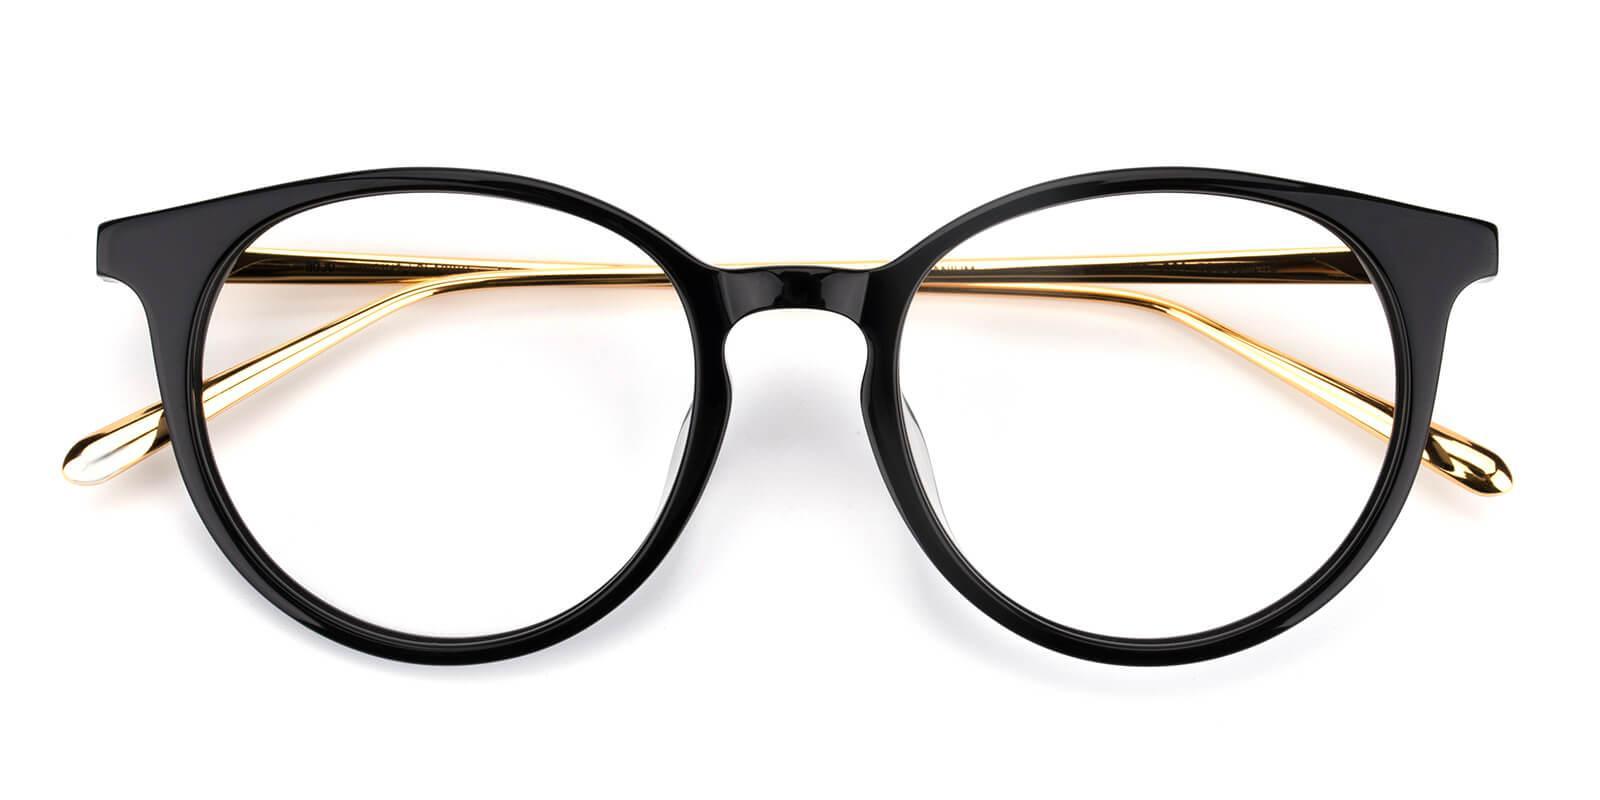 Blrhytem-Black-Round-Titanium-Eyeglasses-detail